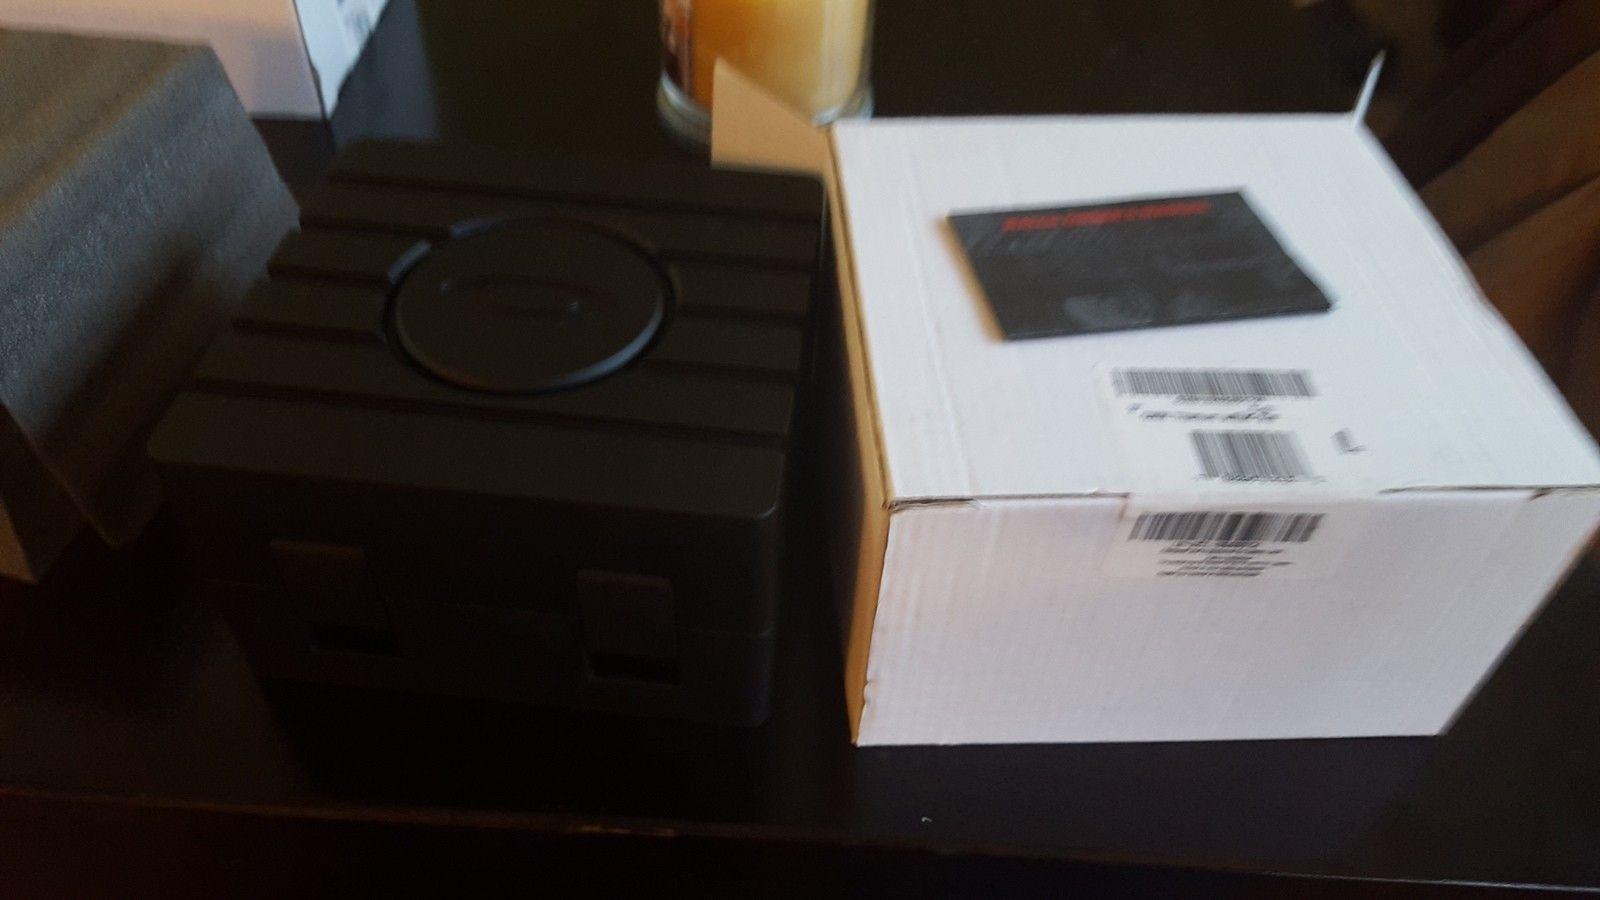 Oakley Watch box - uploadfromtaptalk1448316817681.jpg